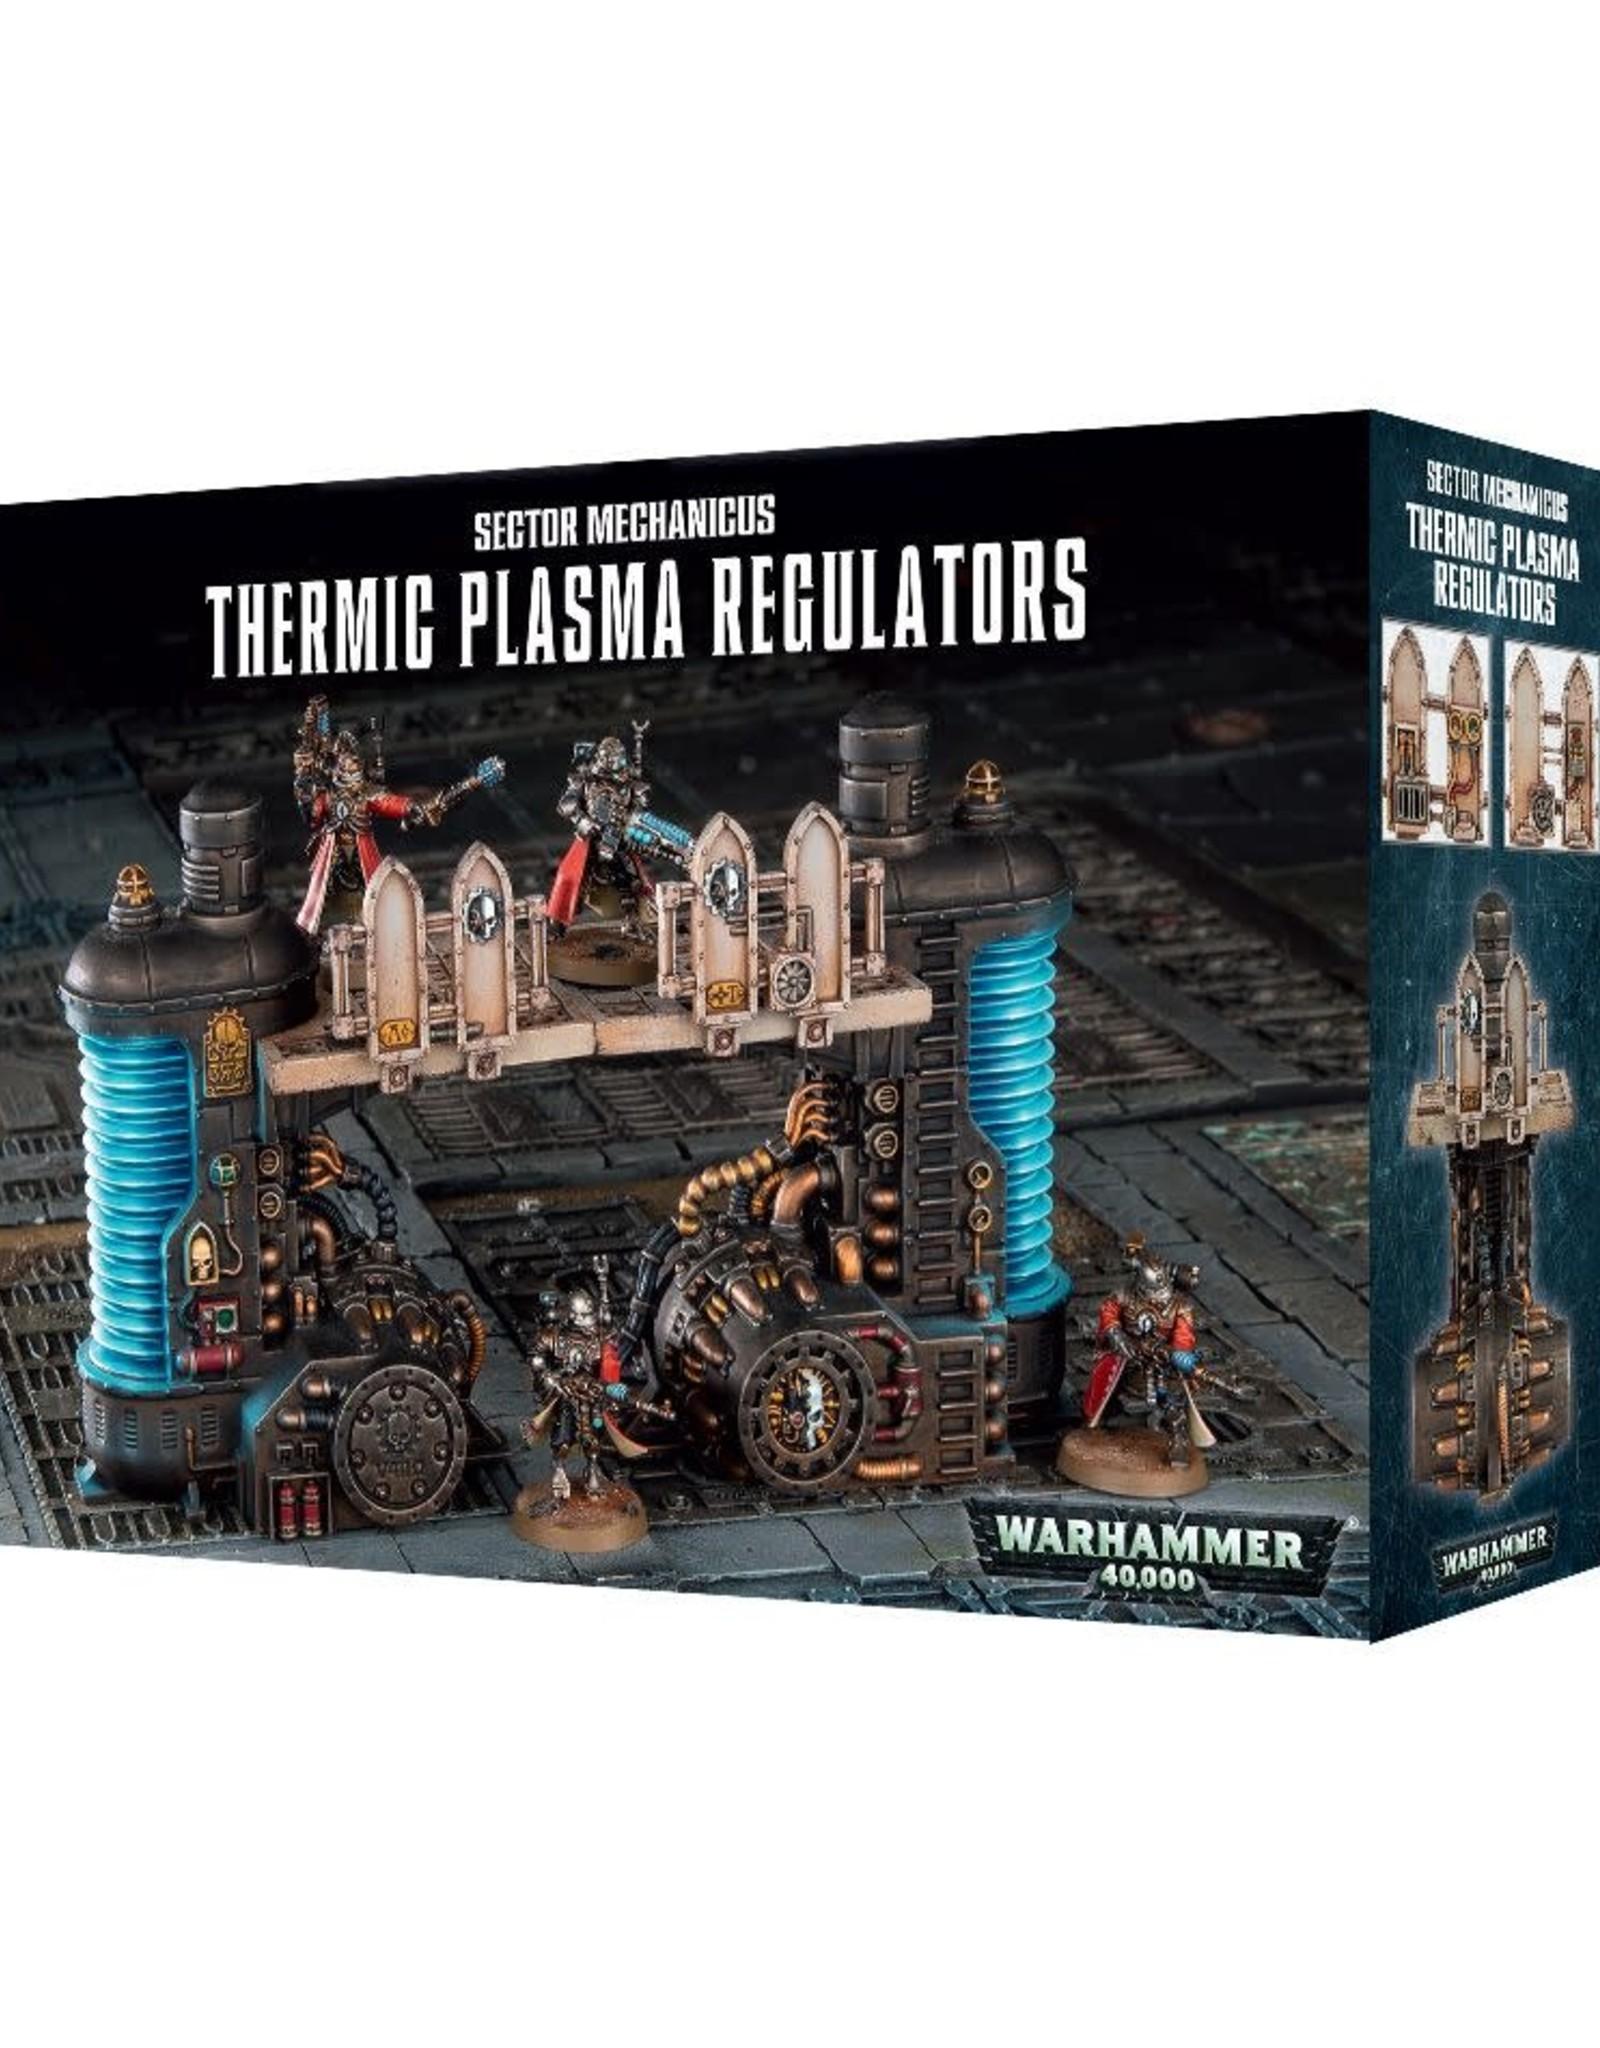 Warhammer 40K Sector Mechanicus: Thermic Plasma Regulators